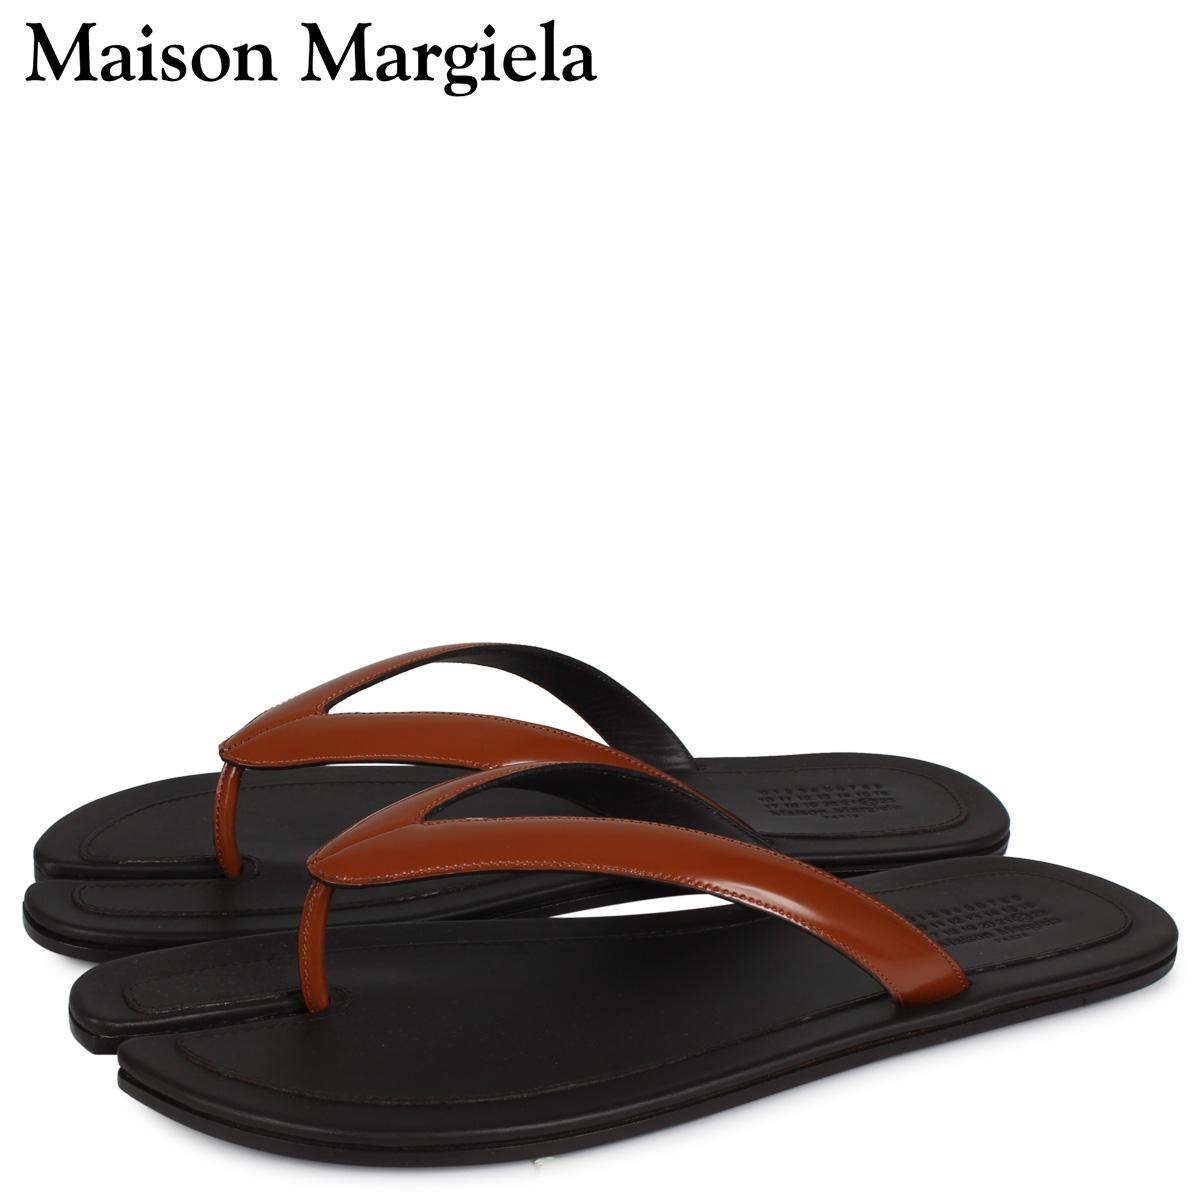 MAISON MARGIELA メゾンマルジェラ タビ フリップ フロップ サンダル ビーチサンダル メンズ TABI FLIP FLOP ブラック 黒 S57WX0023